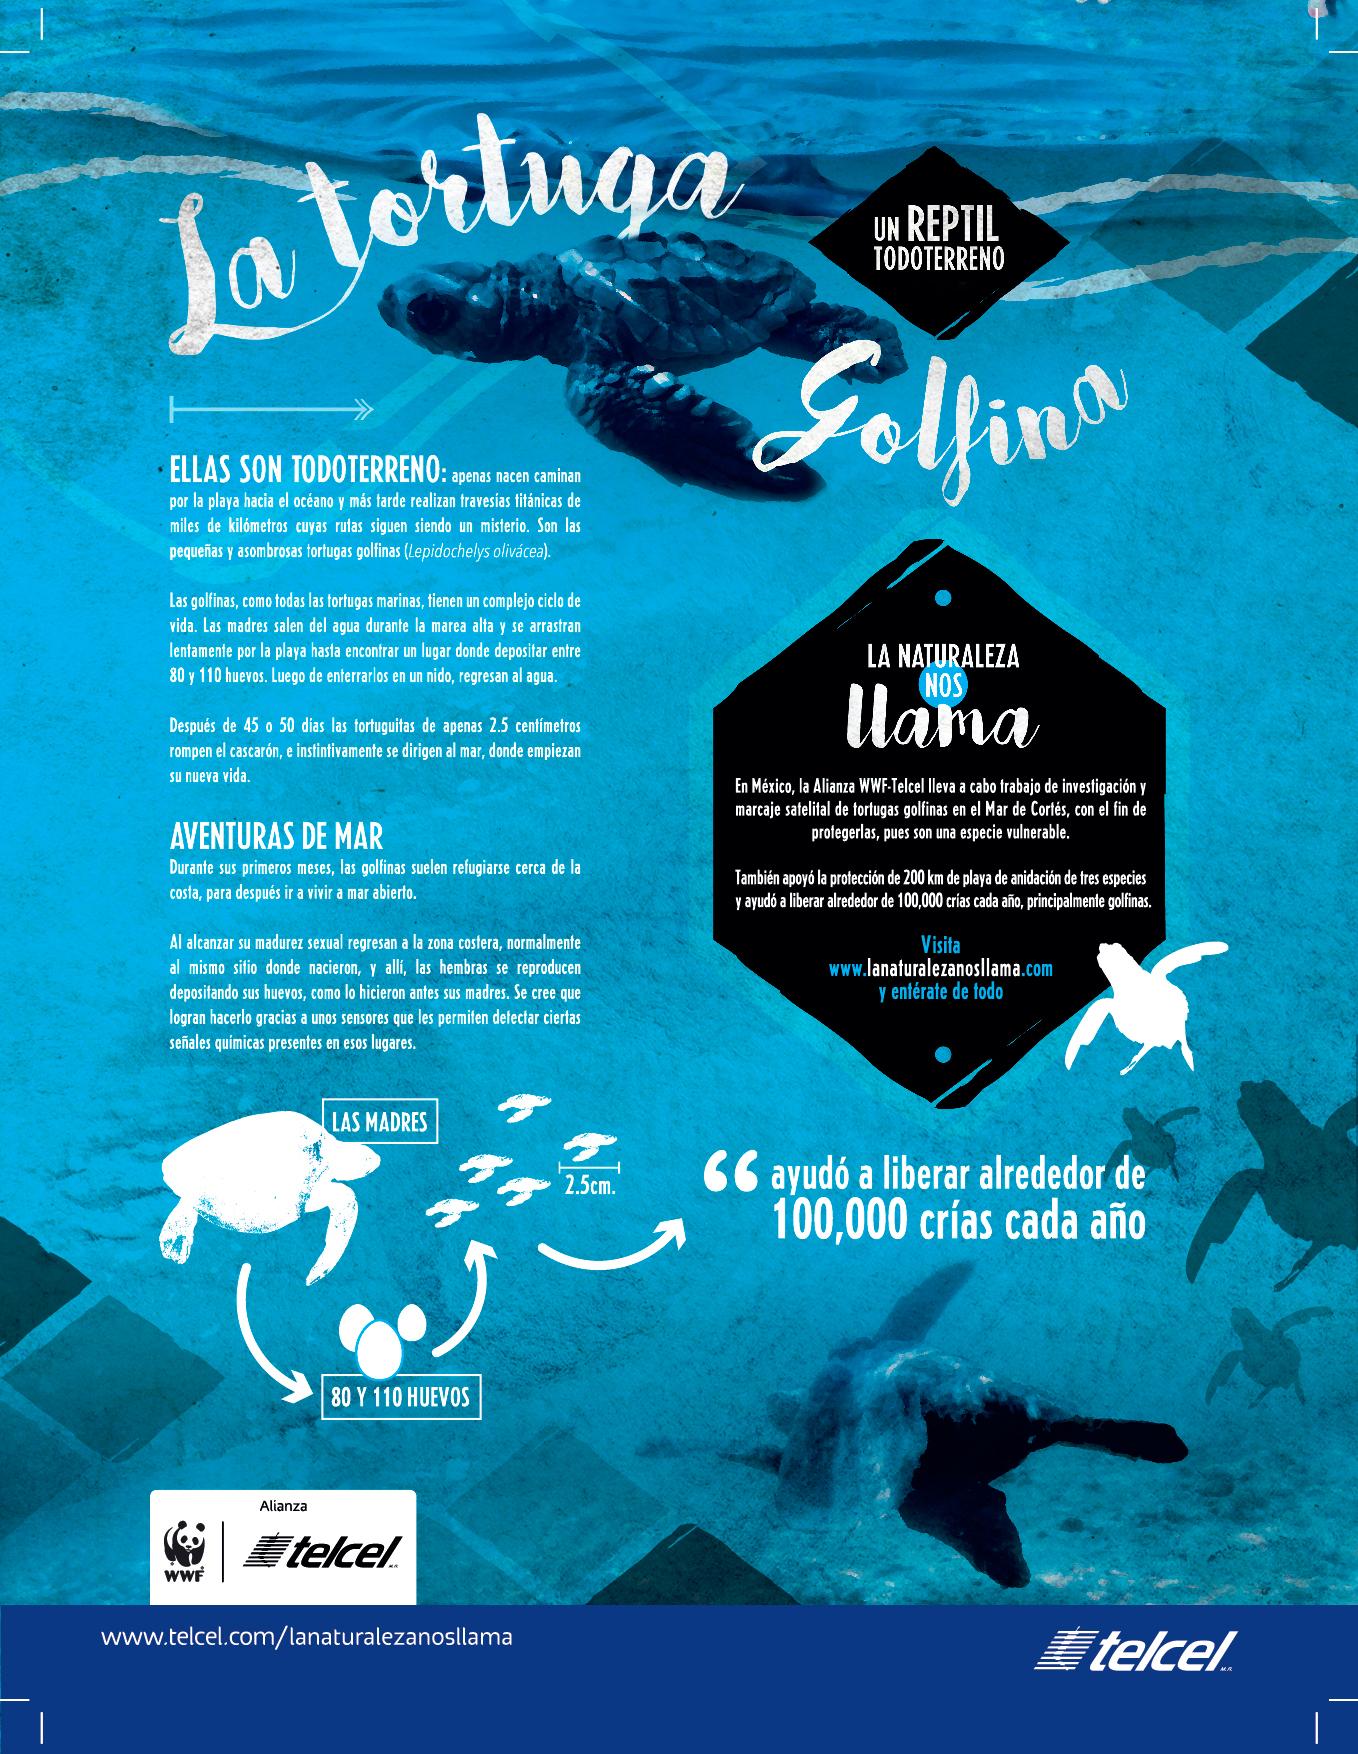 tortuga-golfina-alianza-wwf-telcel